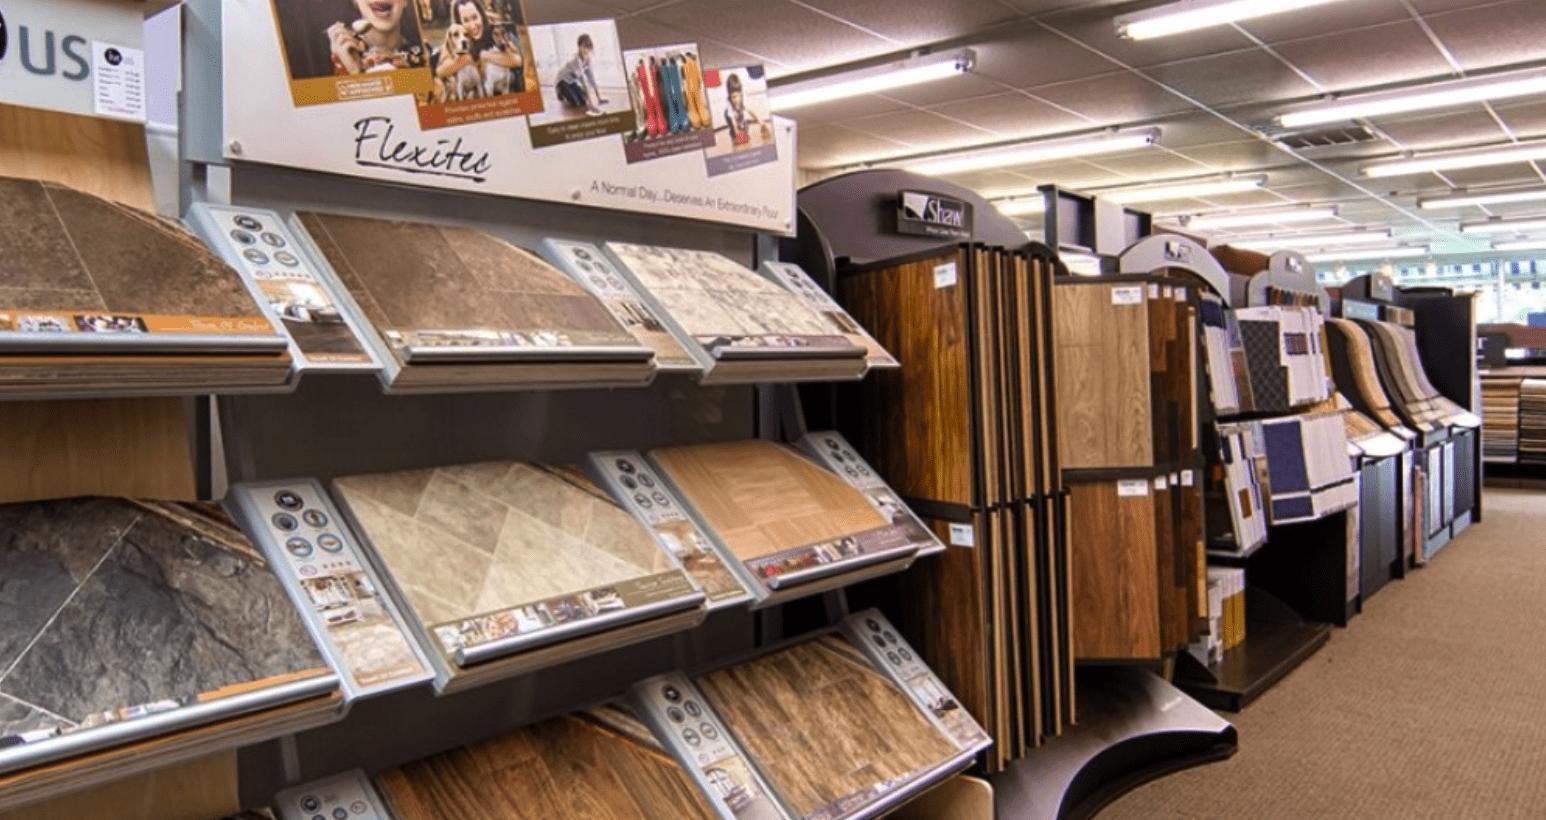 Tile flooring in Georgetown, SC from the Waccamaw Floor Covering showroom